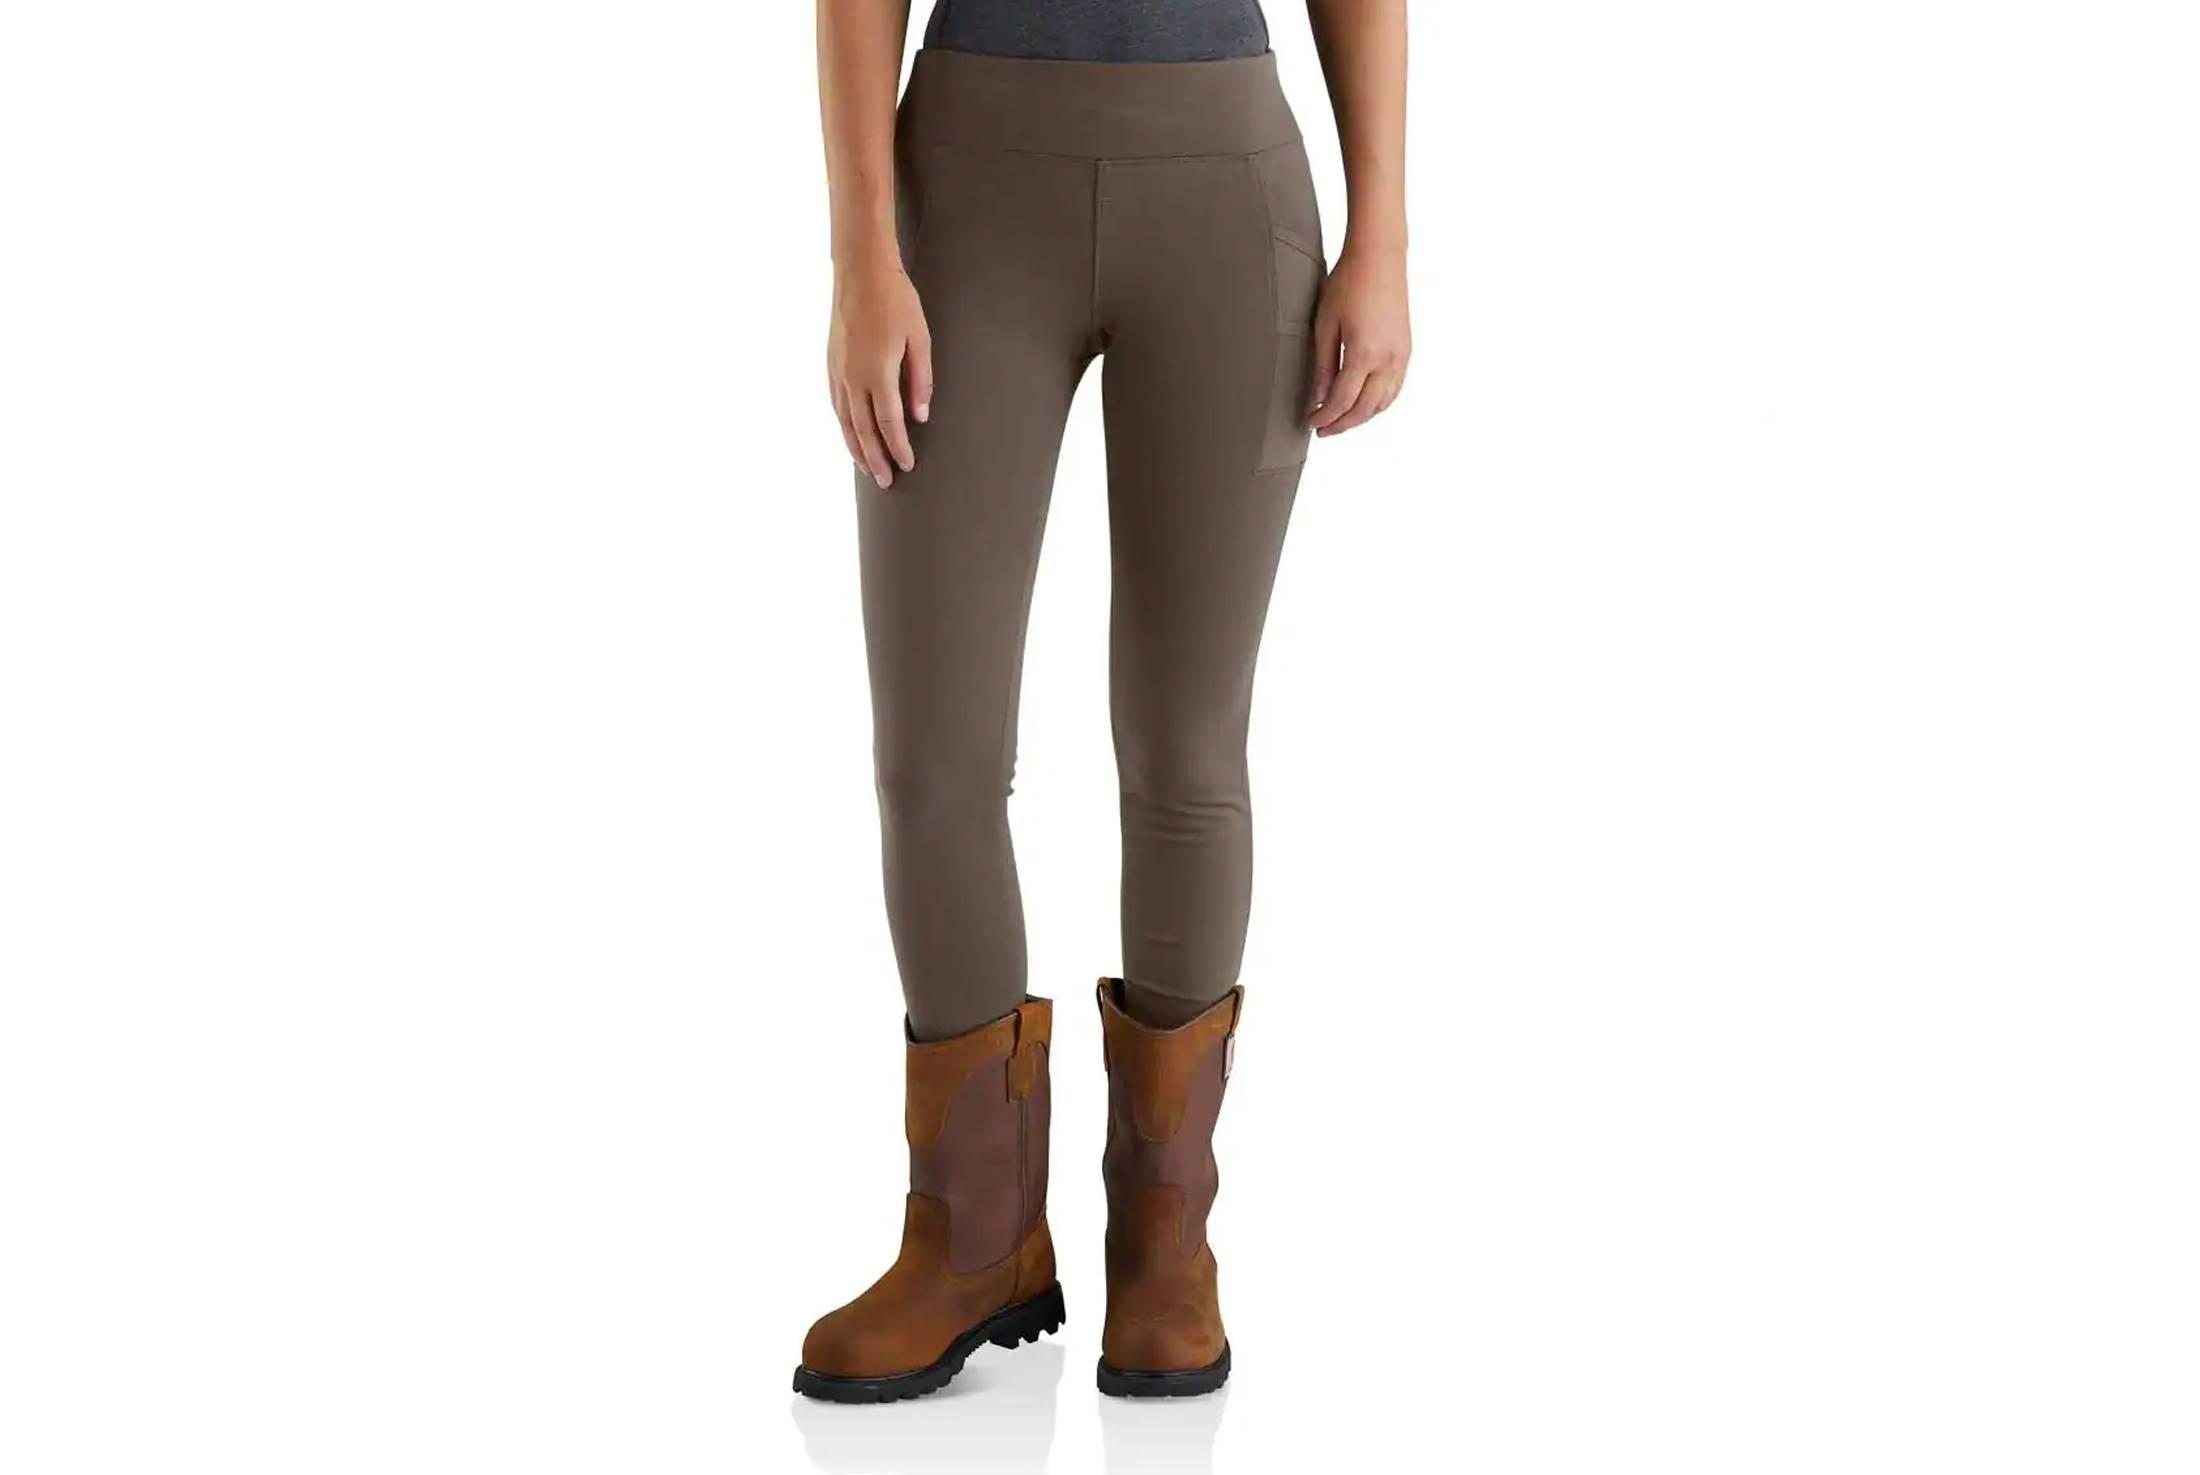 Carhartt lightweight utility leggings